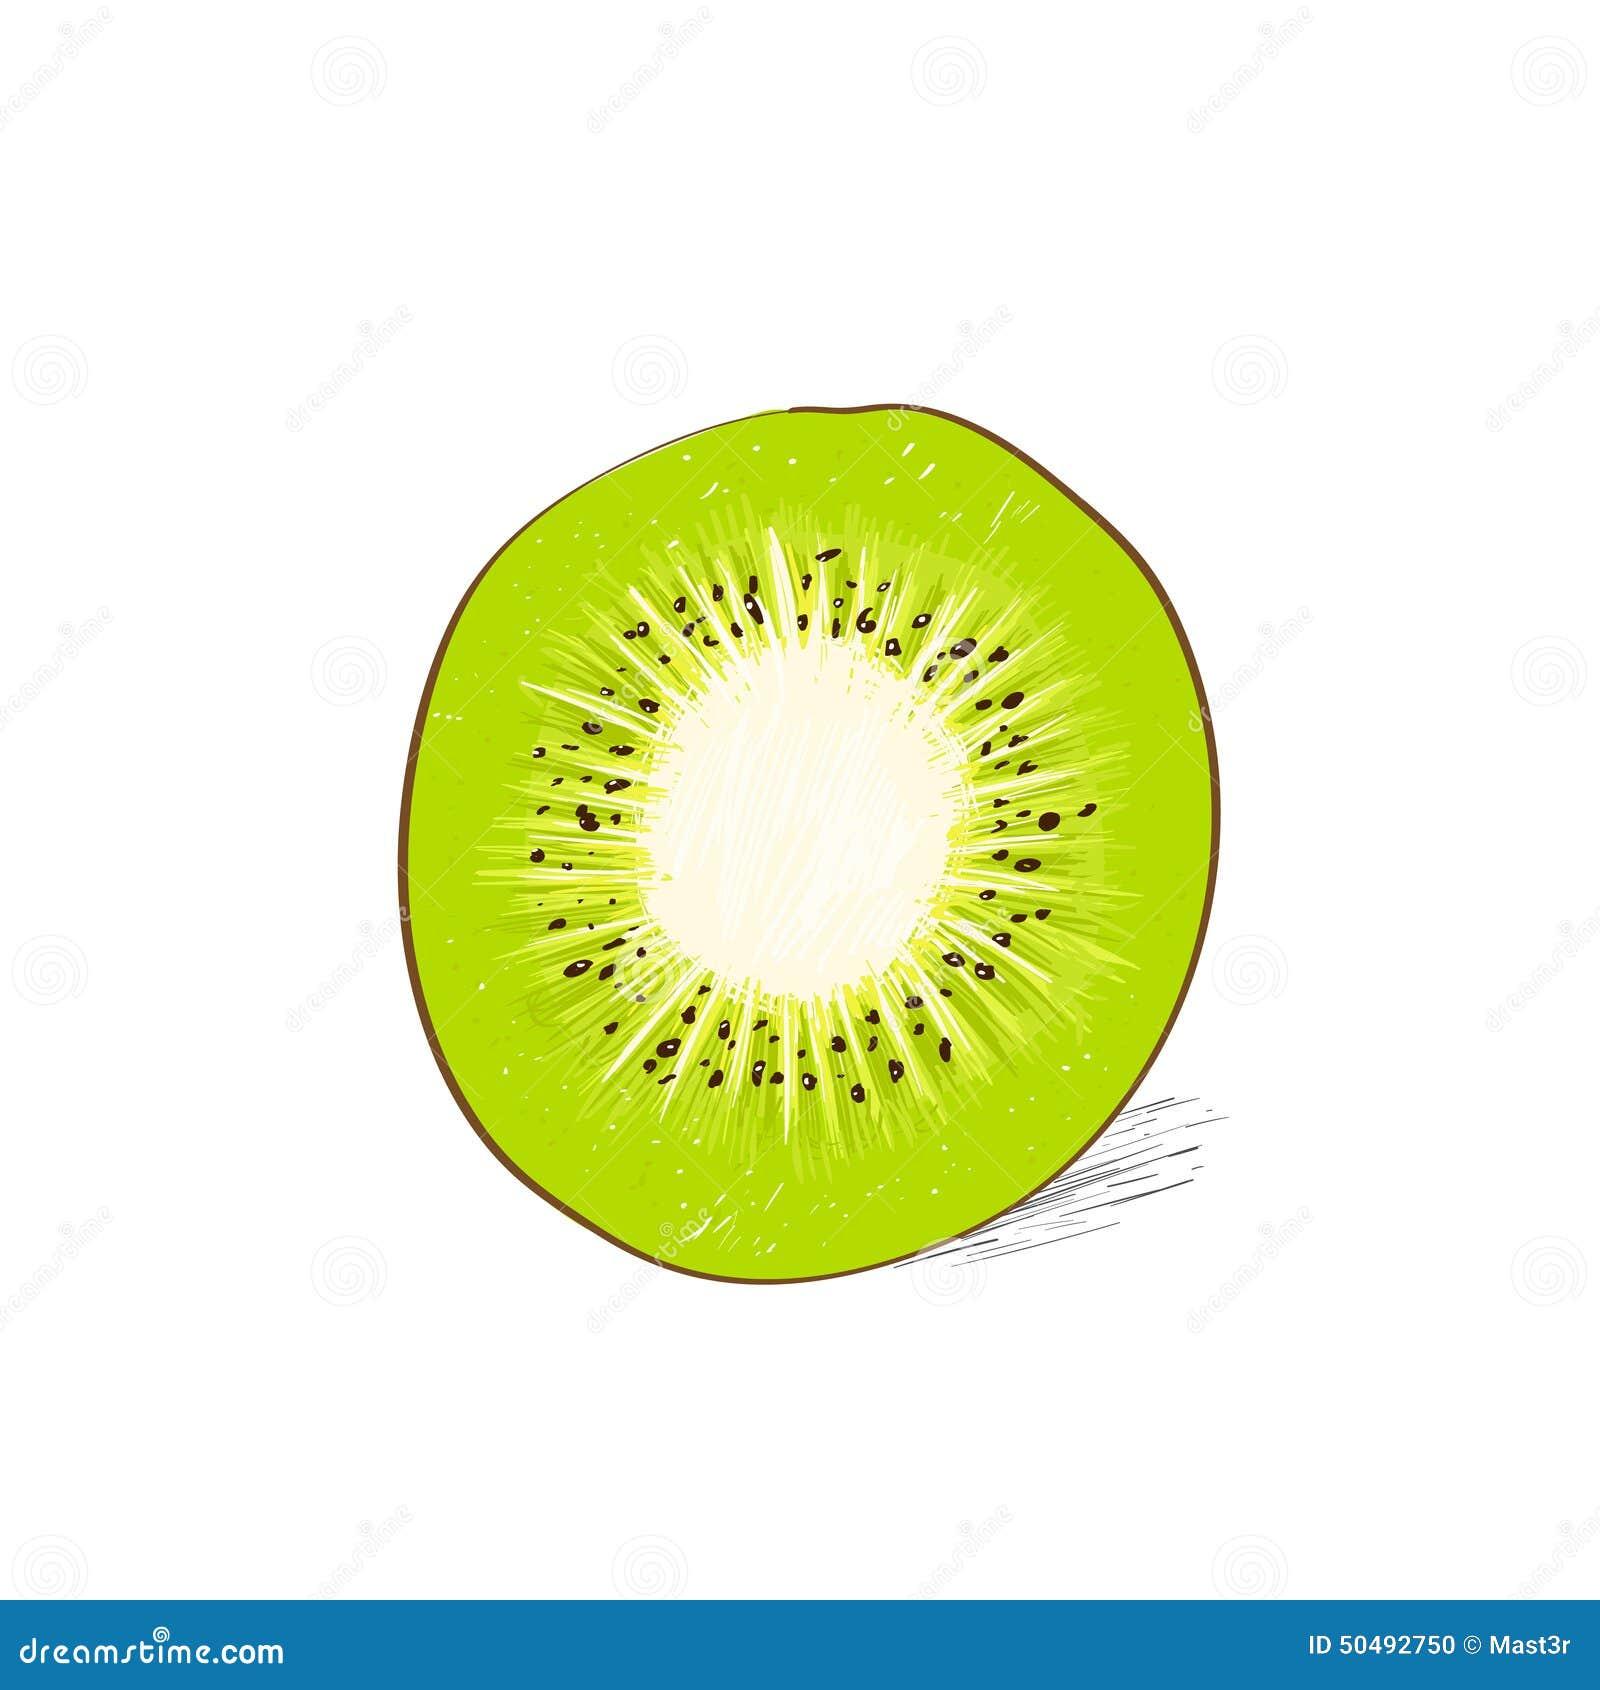 Kiwi cut half slice co...